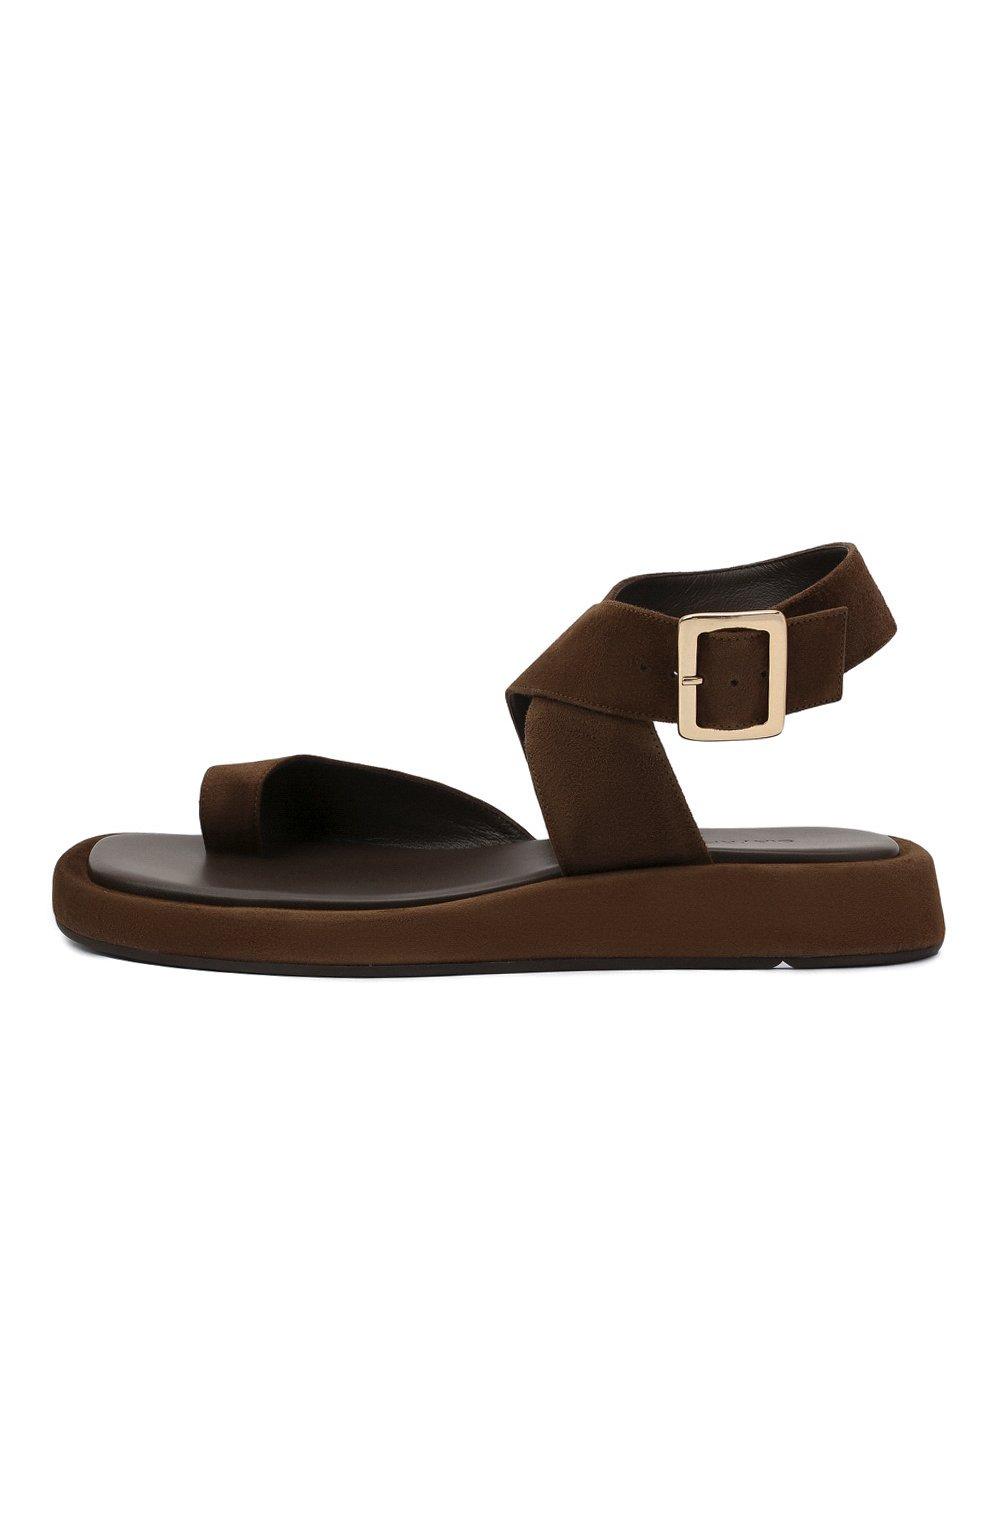 Женские замшевые сандалии GIA COUTURE темно-коричневого цвета, арт. R0SIE-4 A 213 | Фото 3